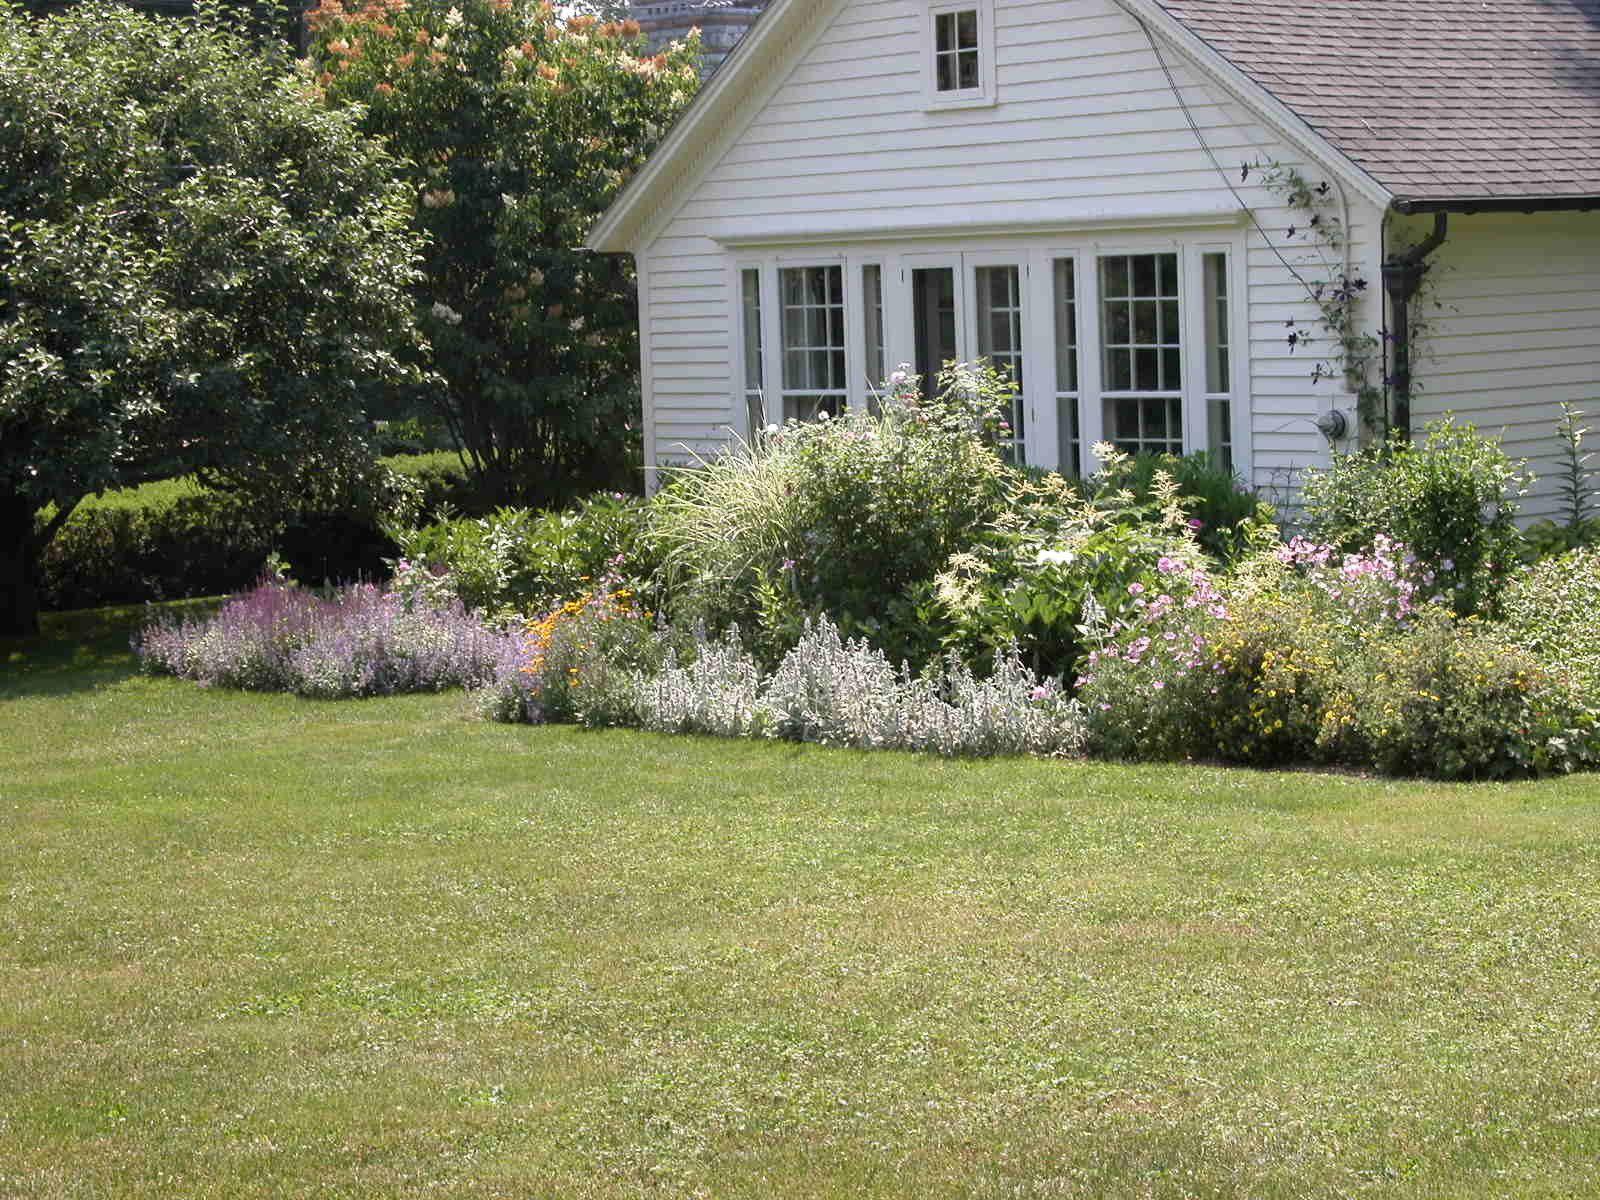 12 Tips For Designing A Small Garden